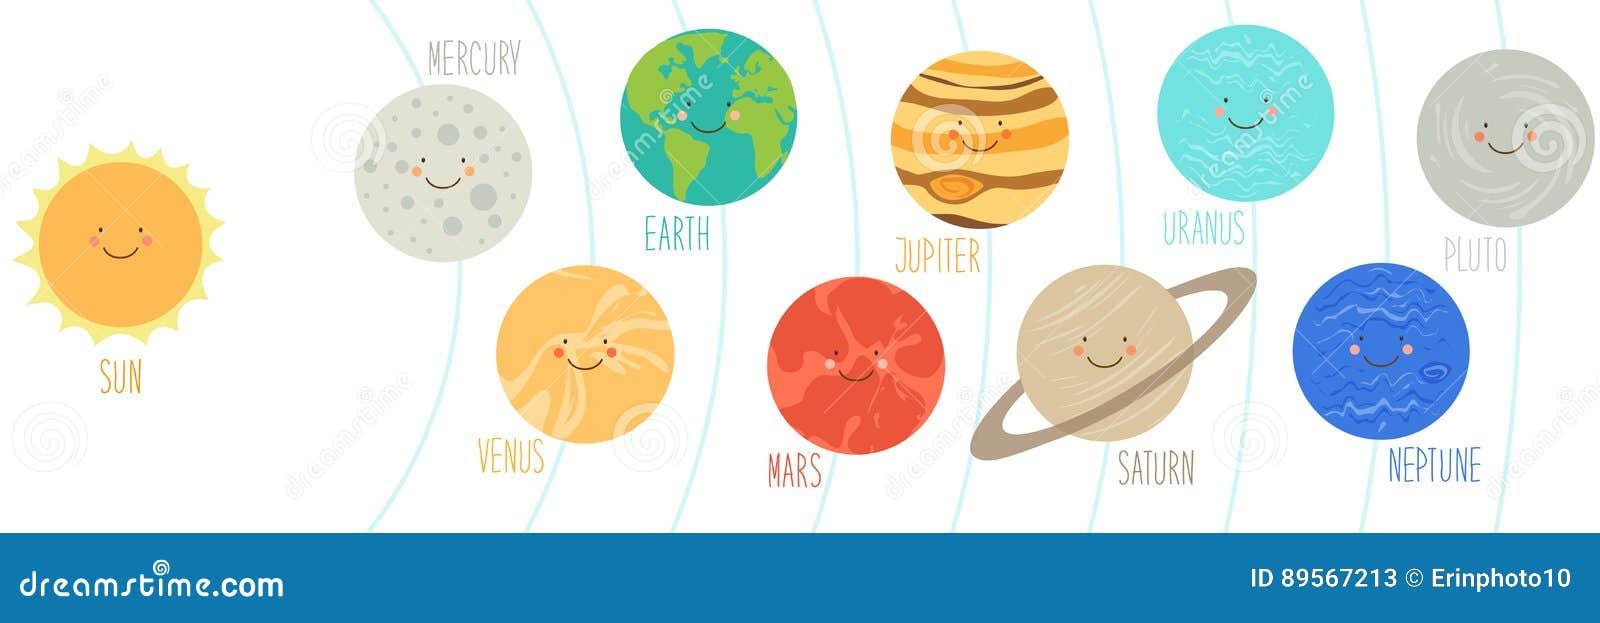 Personajes De Dibujos Animados Sonrientes Lindos De Planetas